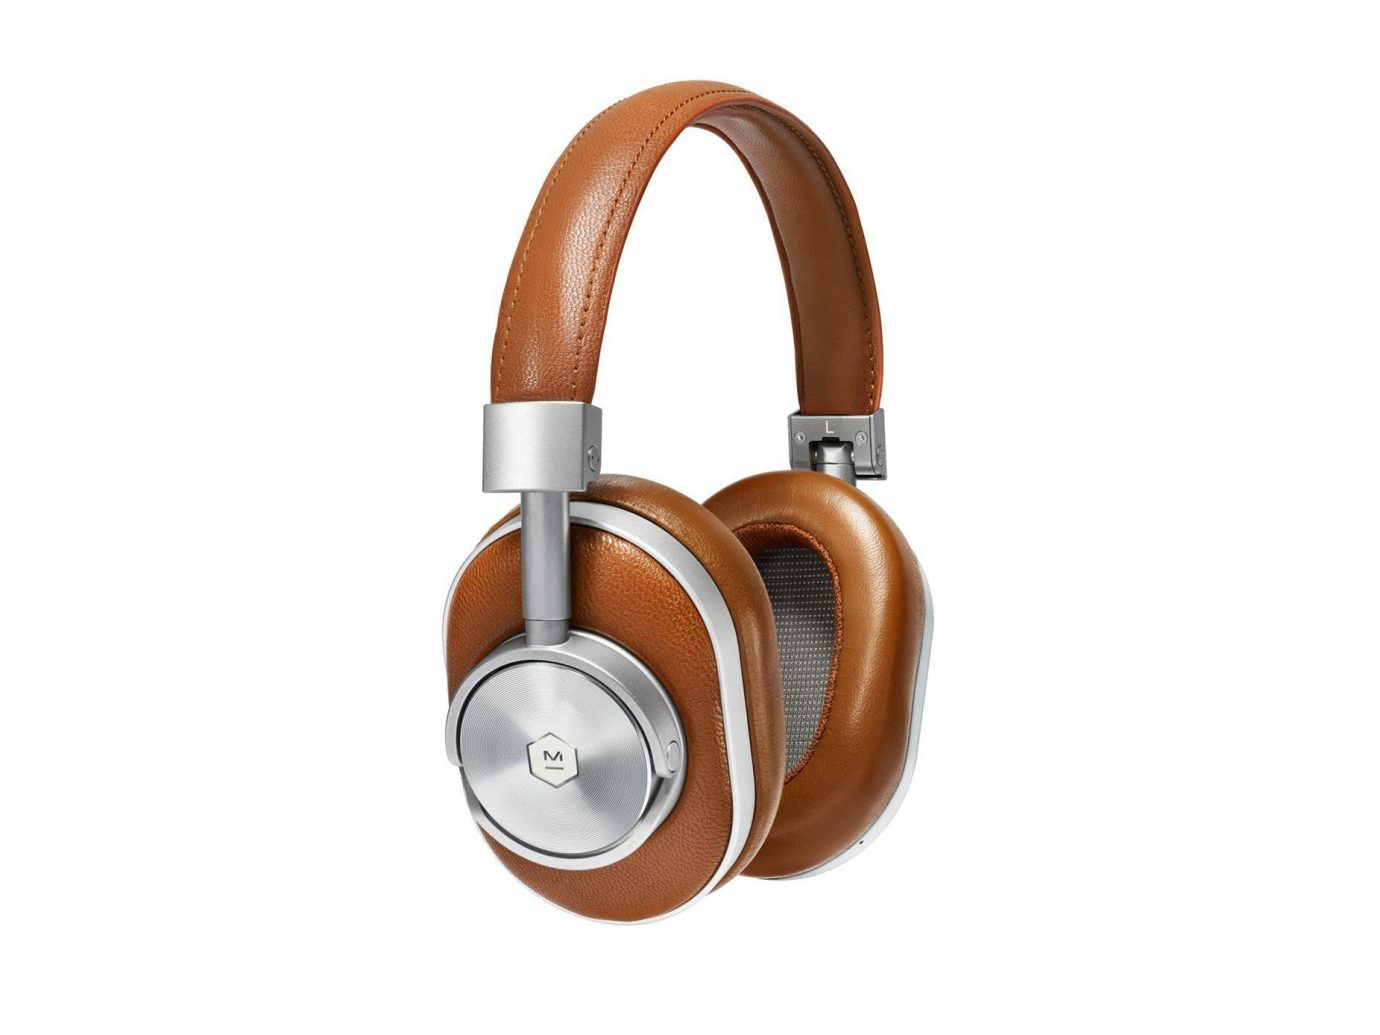 Style + Design headphones audio equipment gadget audio technology electronic device ear